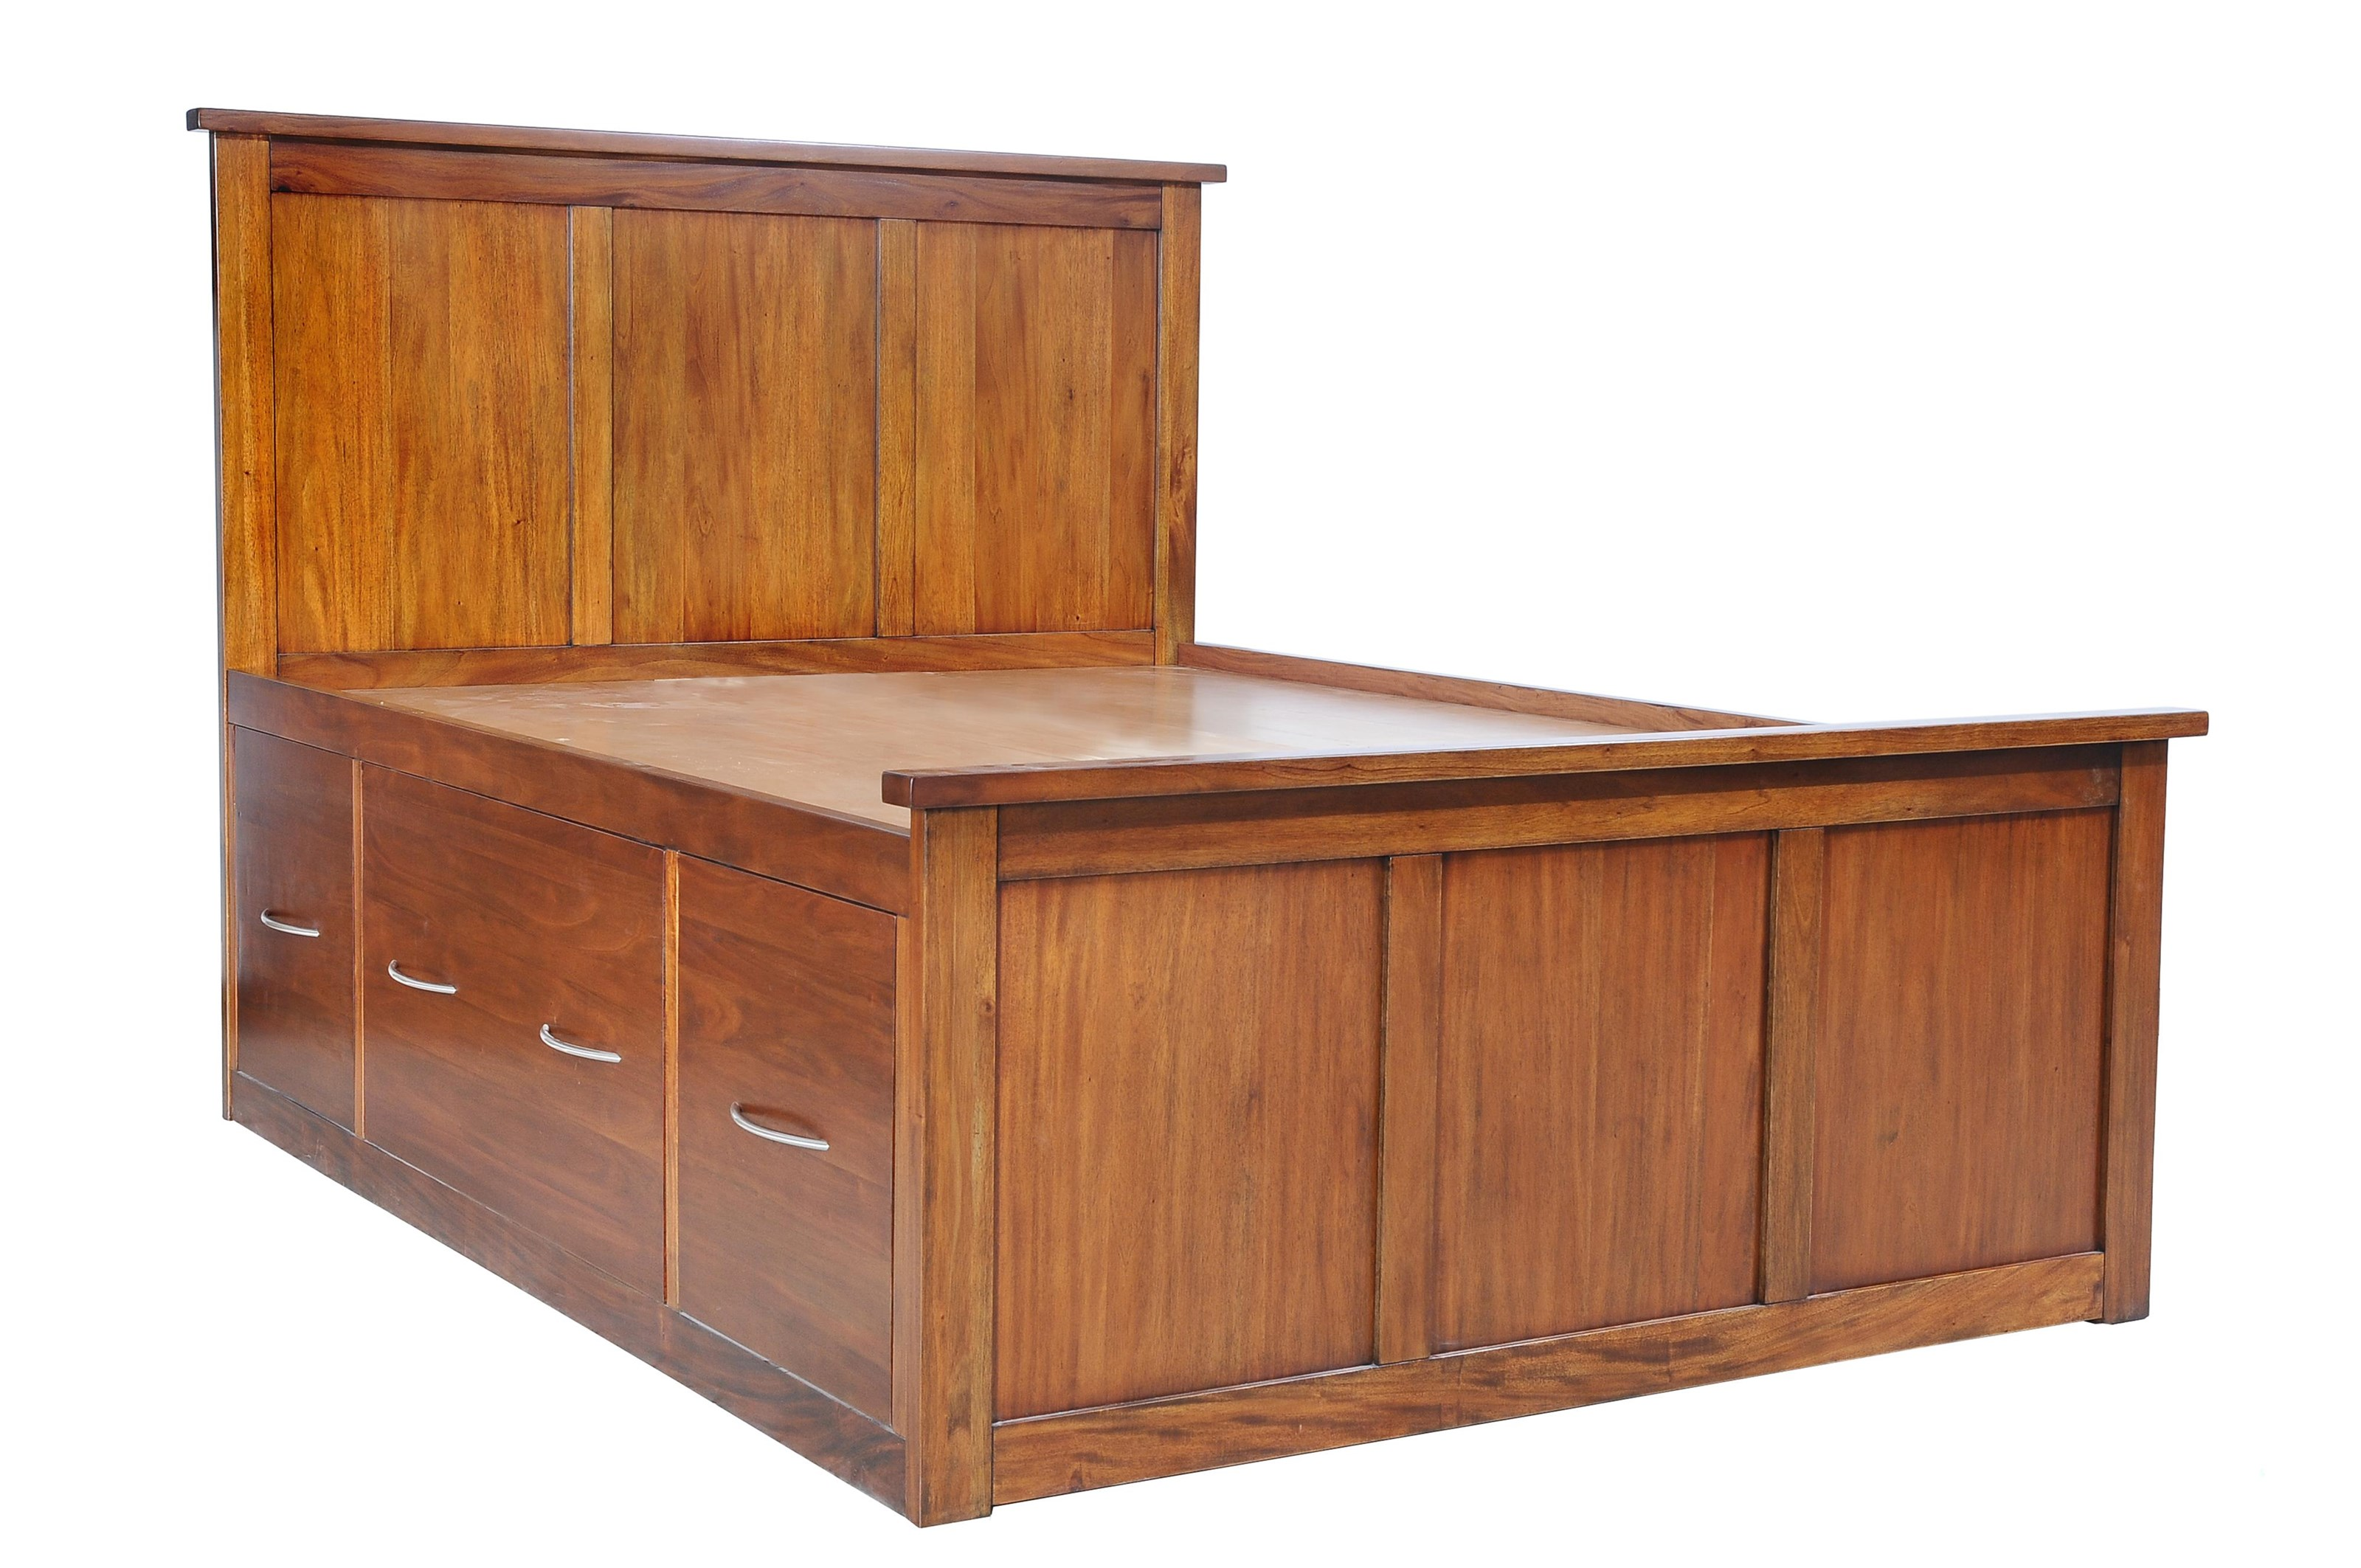 Boston Brownstone 9 Drawer King Bed by Napa Furniture Designs at HomeWorld Furniture